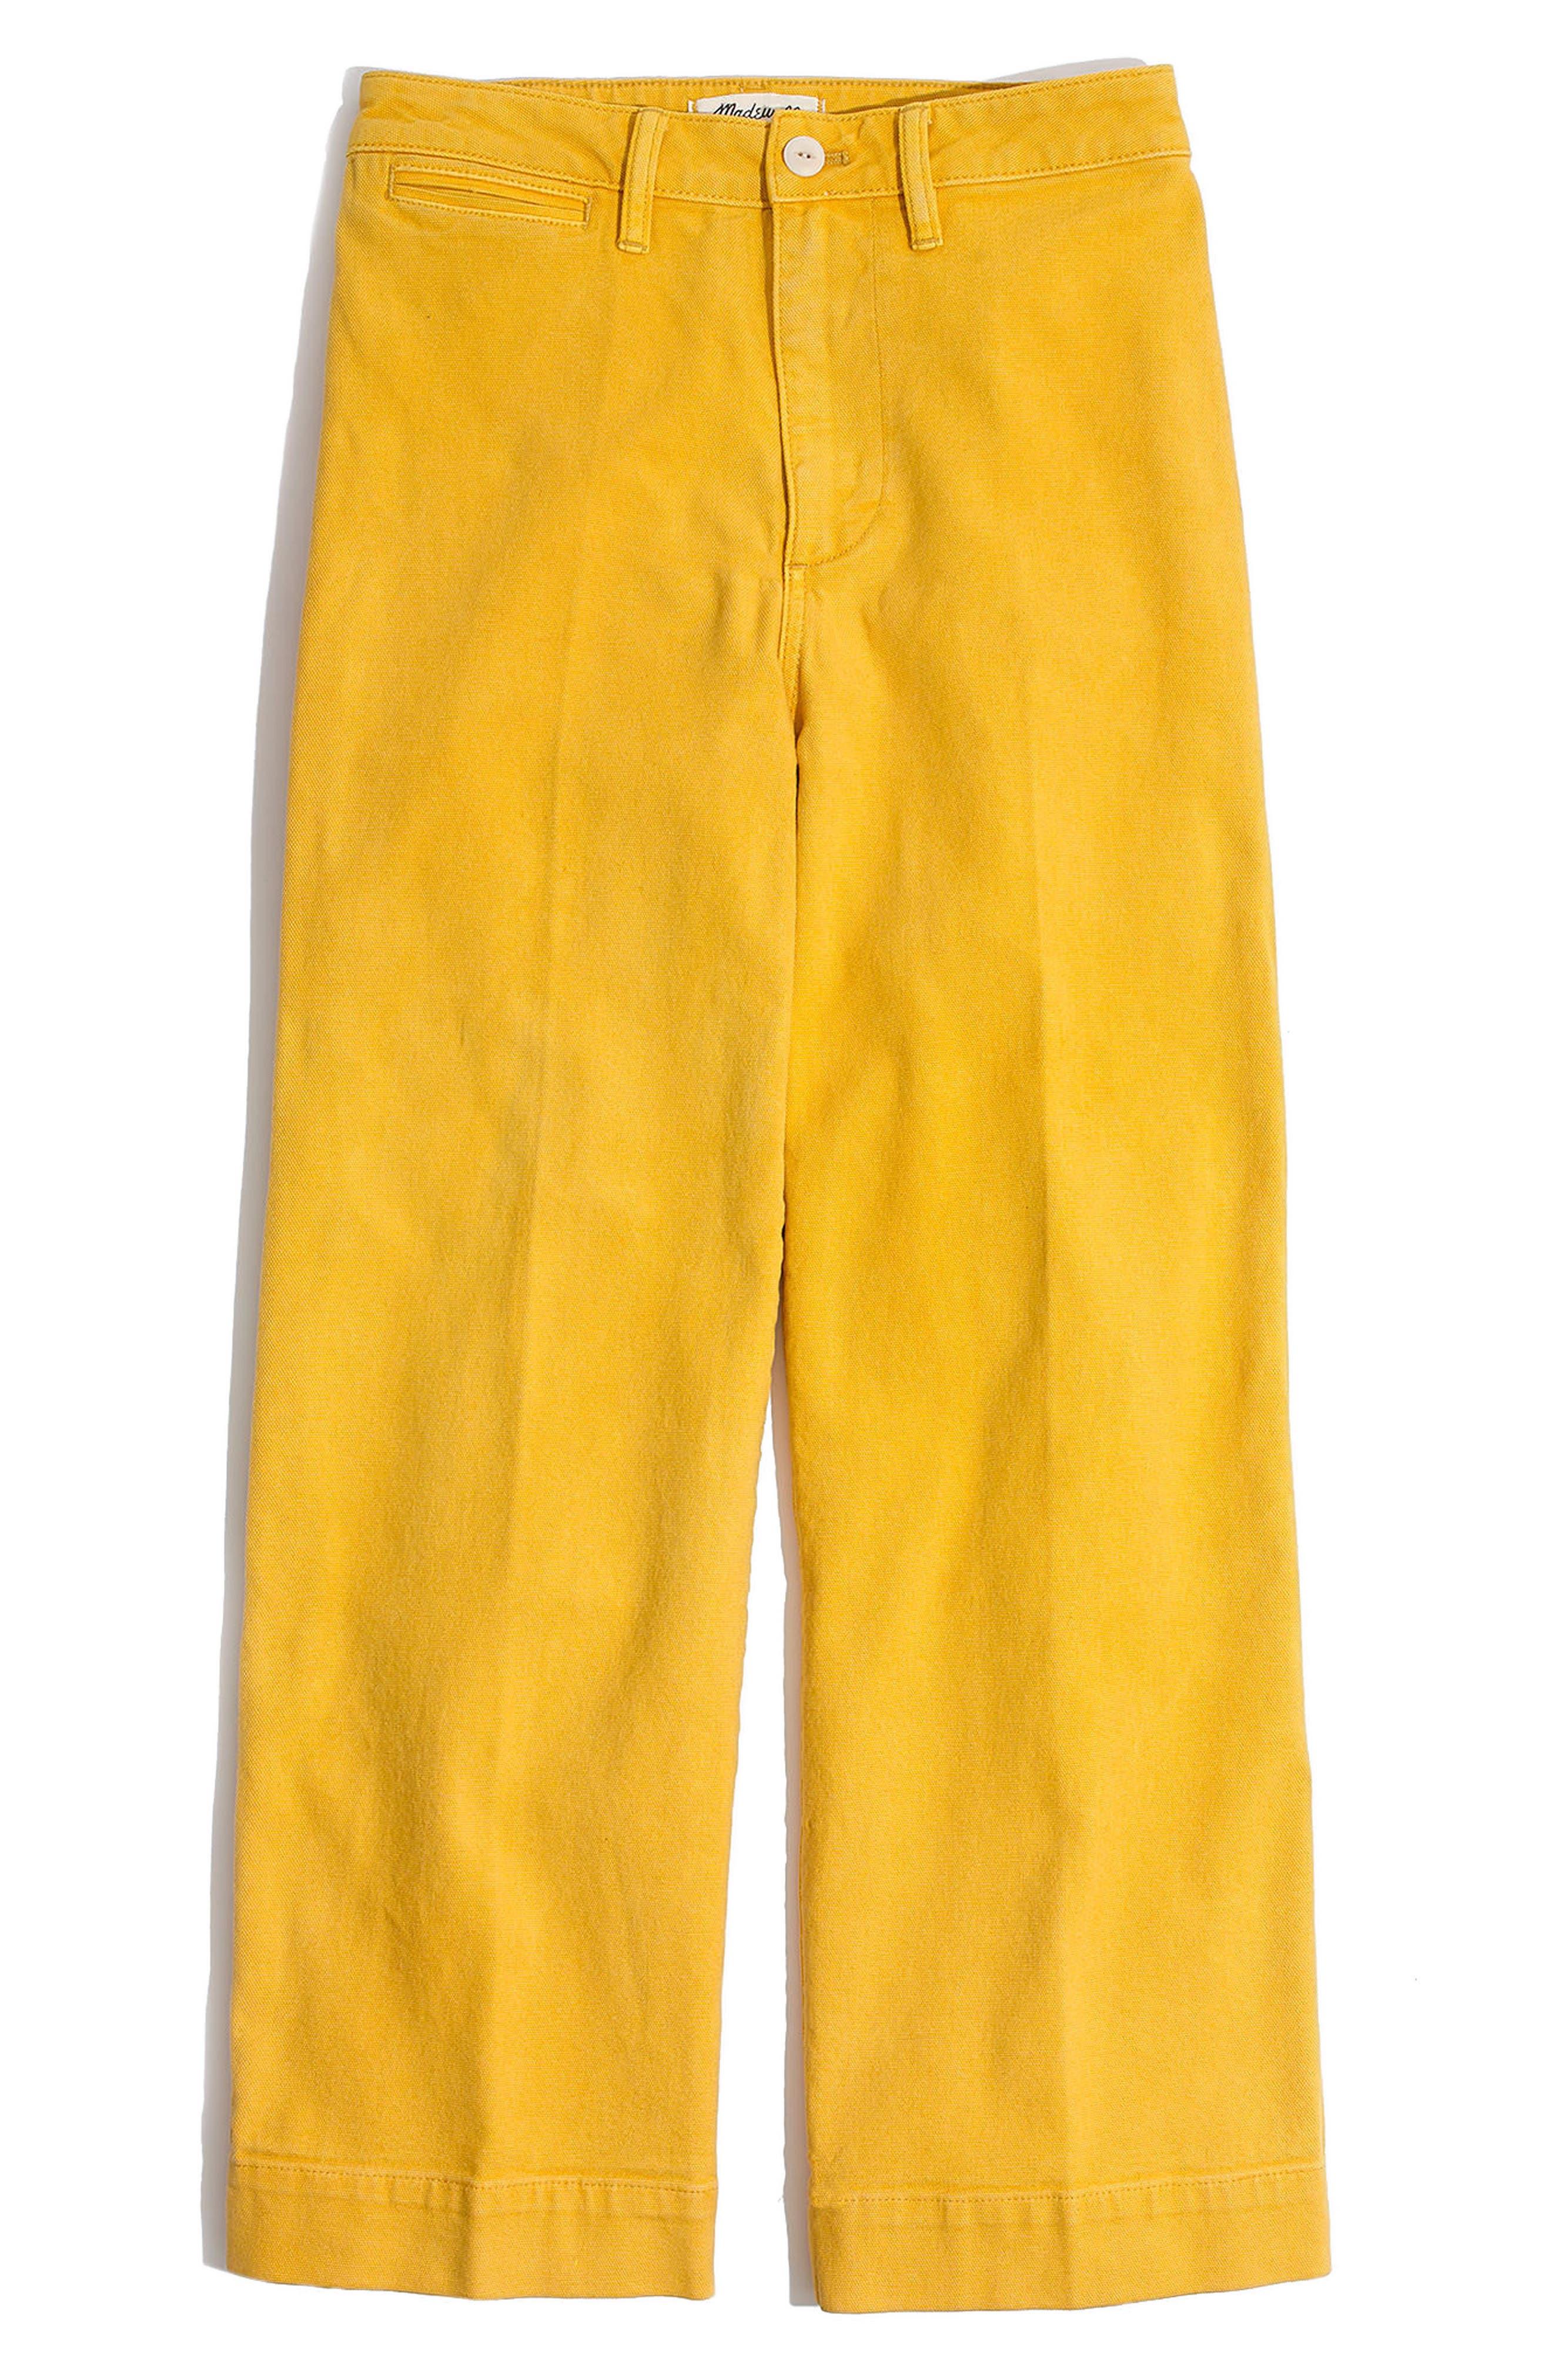 Emmett Crop Wide Leg Pants,                         Main,                         color, Greek Gold